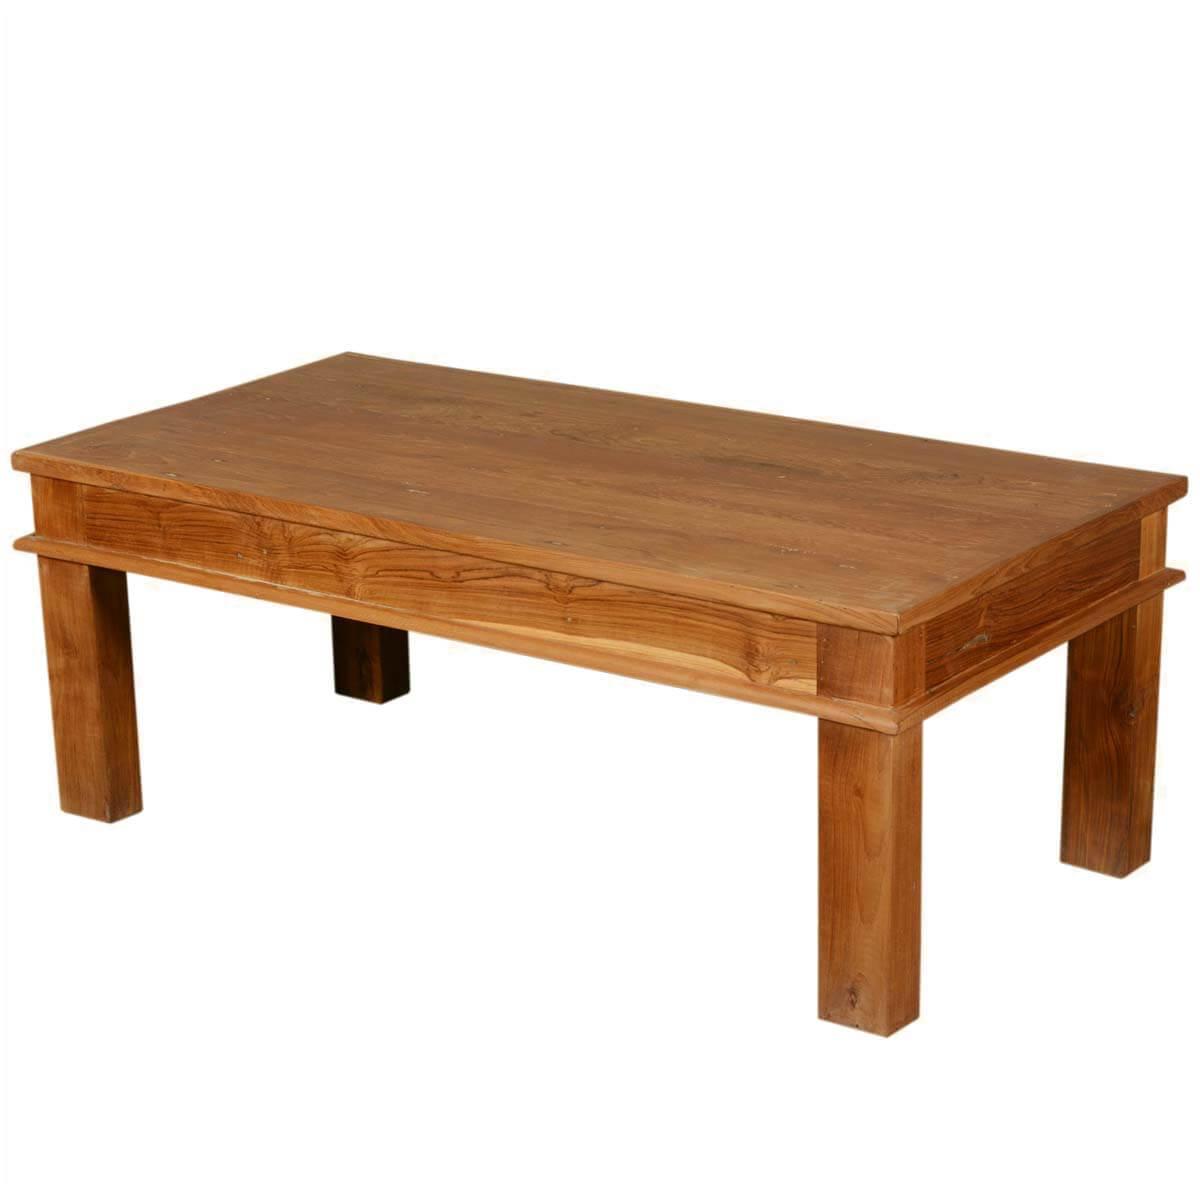 48 Solid Teak Wood Danish Rustic Coffee Table